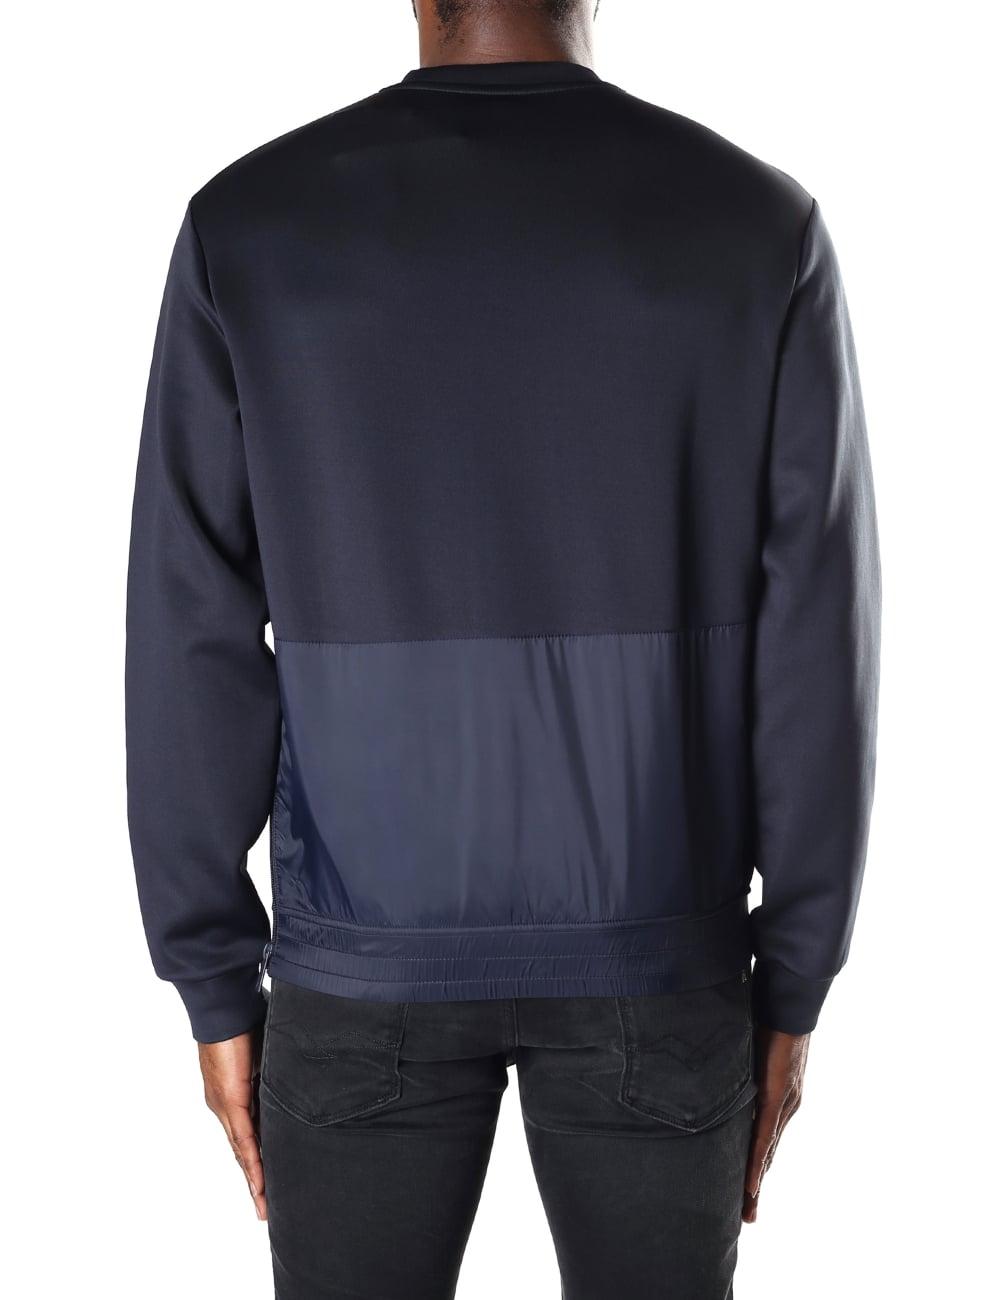 Armani Jeans Men s Crew Neck Sweat Top 2816a3169253